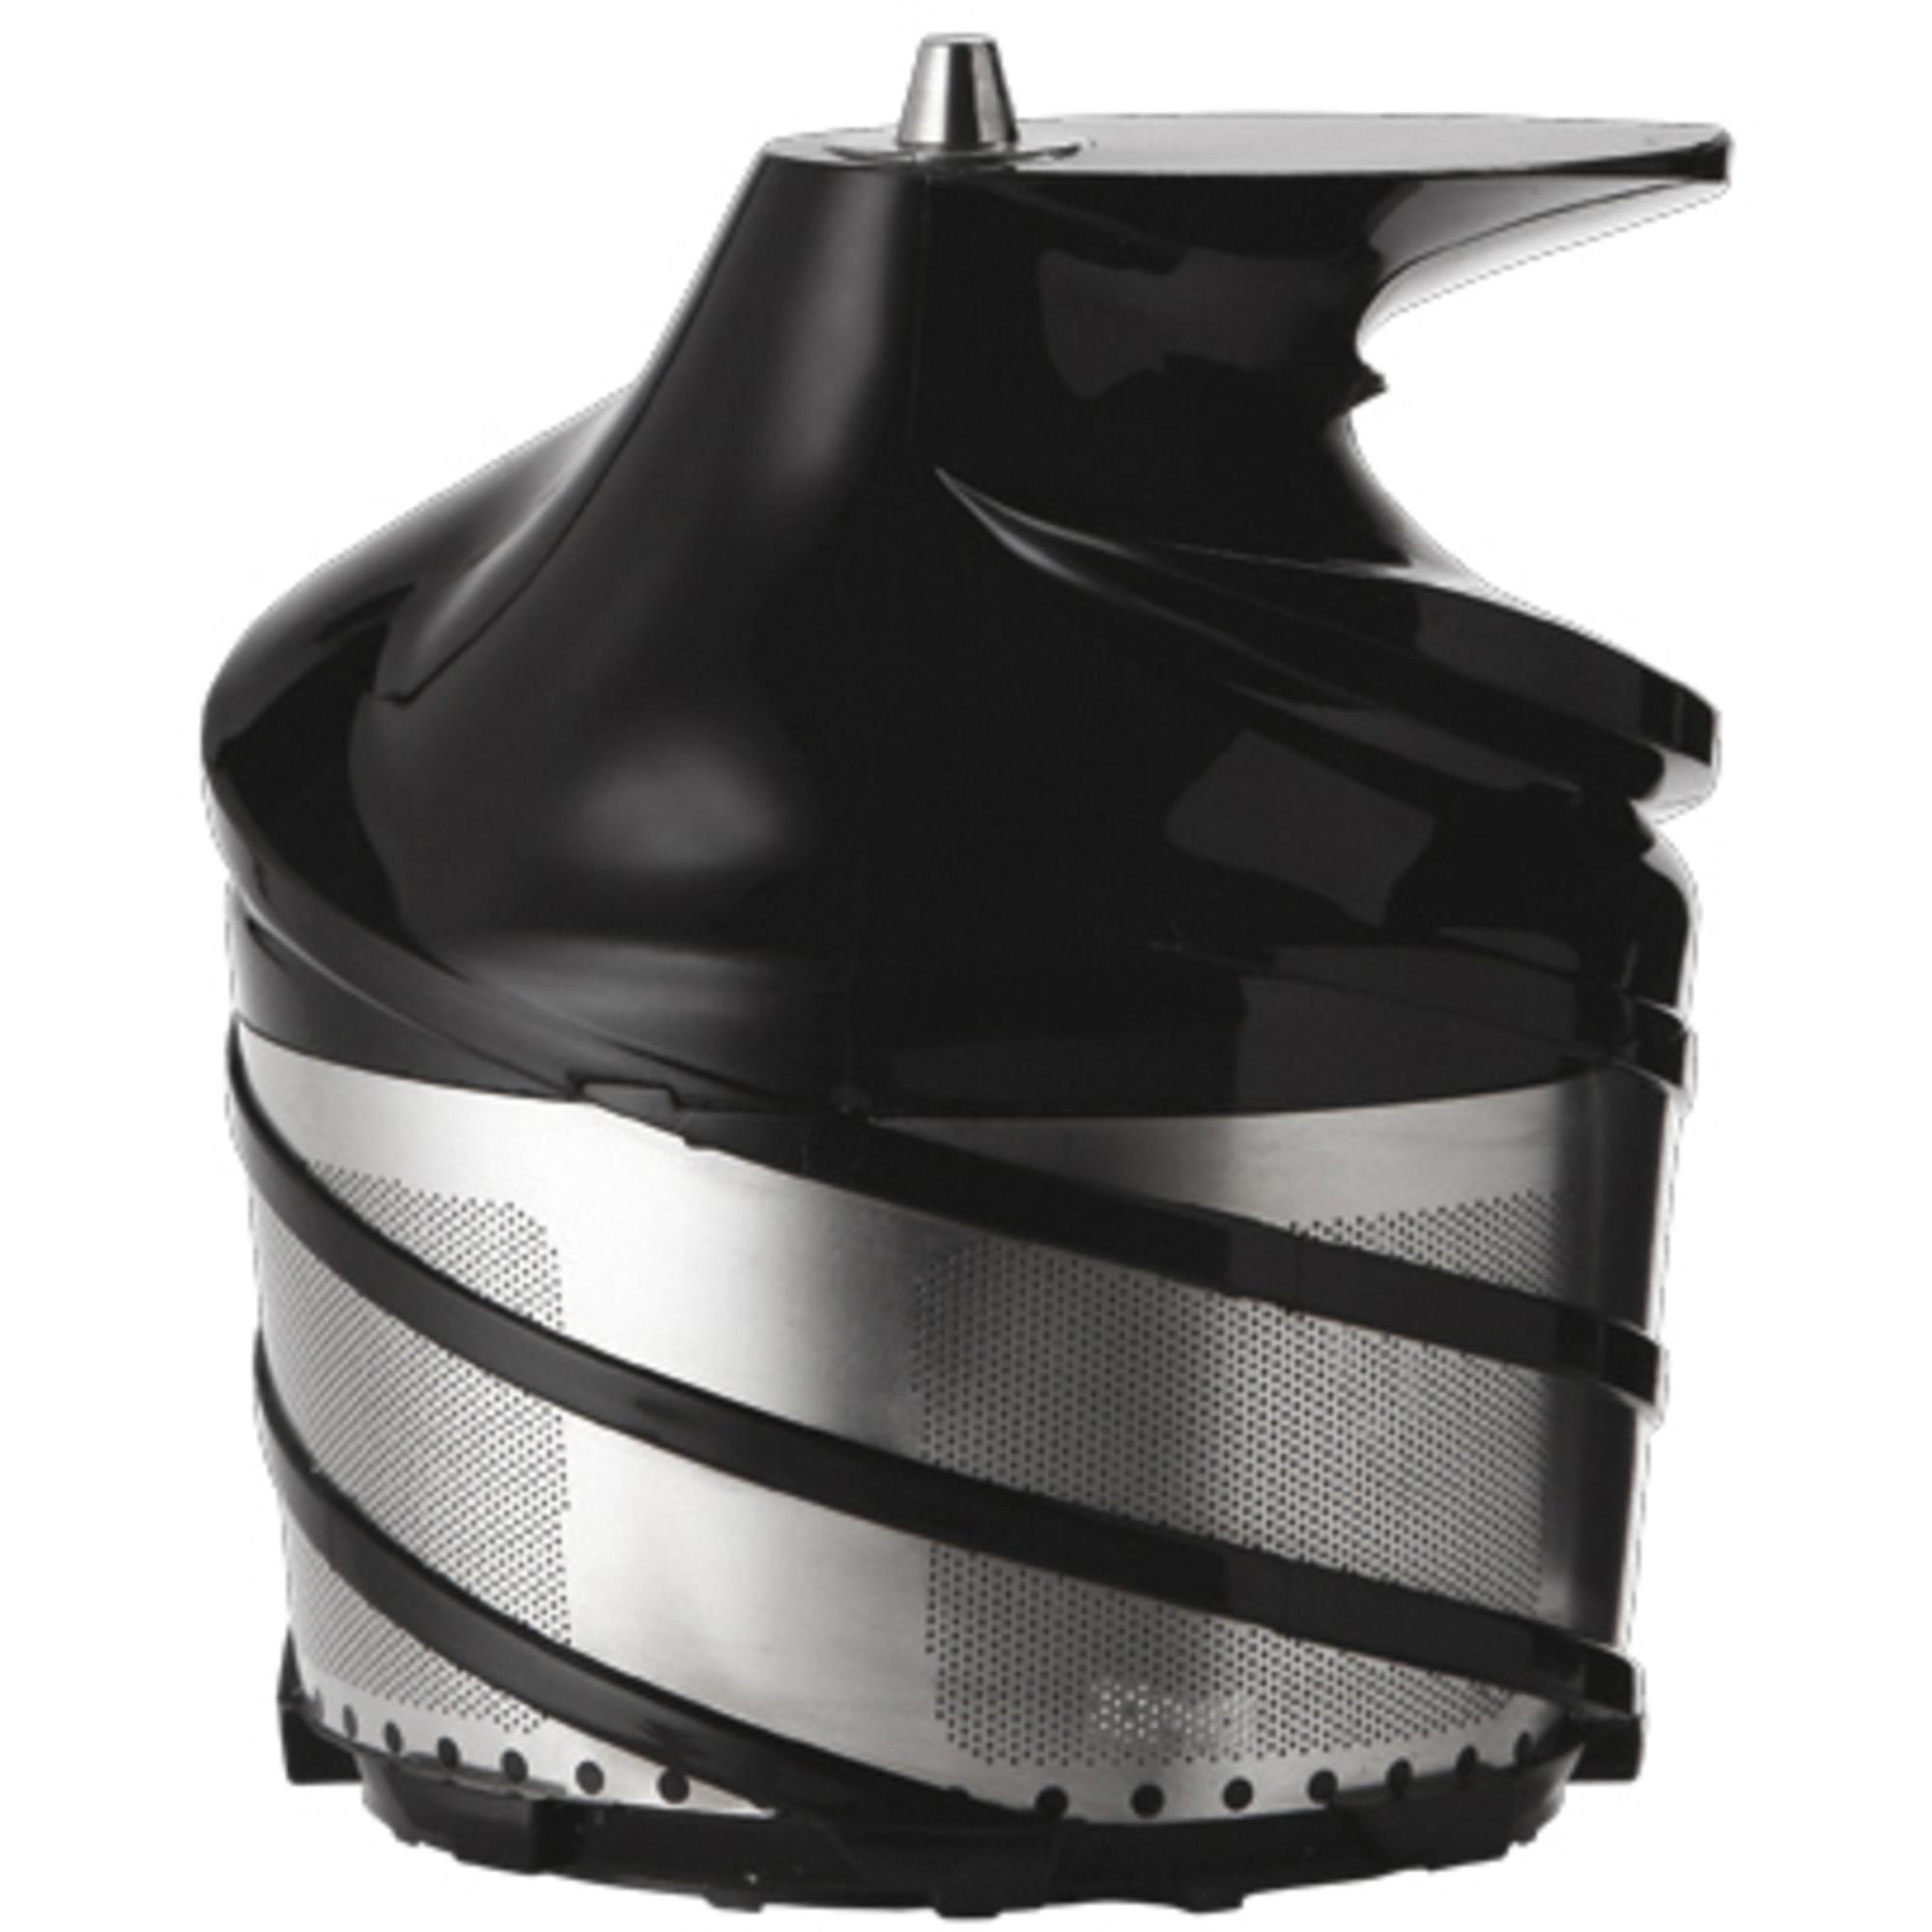 Witt Juicepresso screw / filter